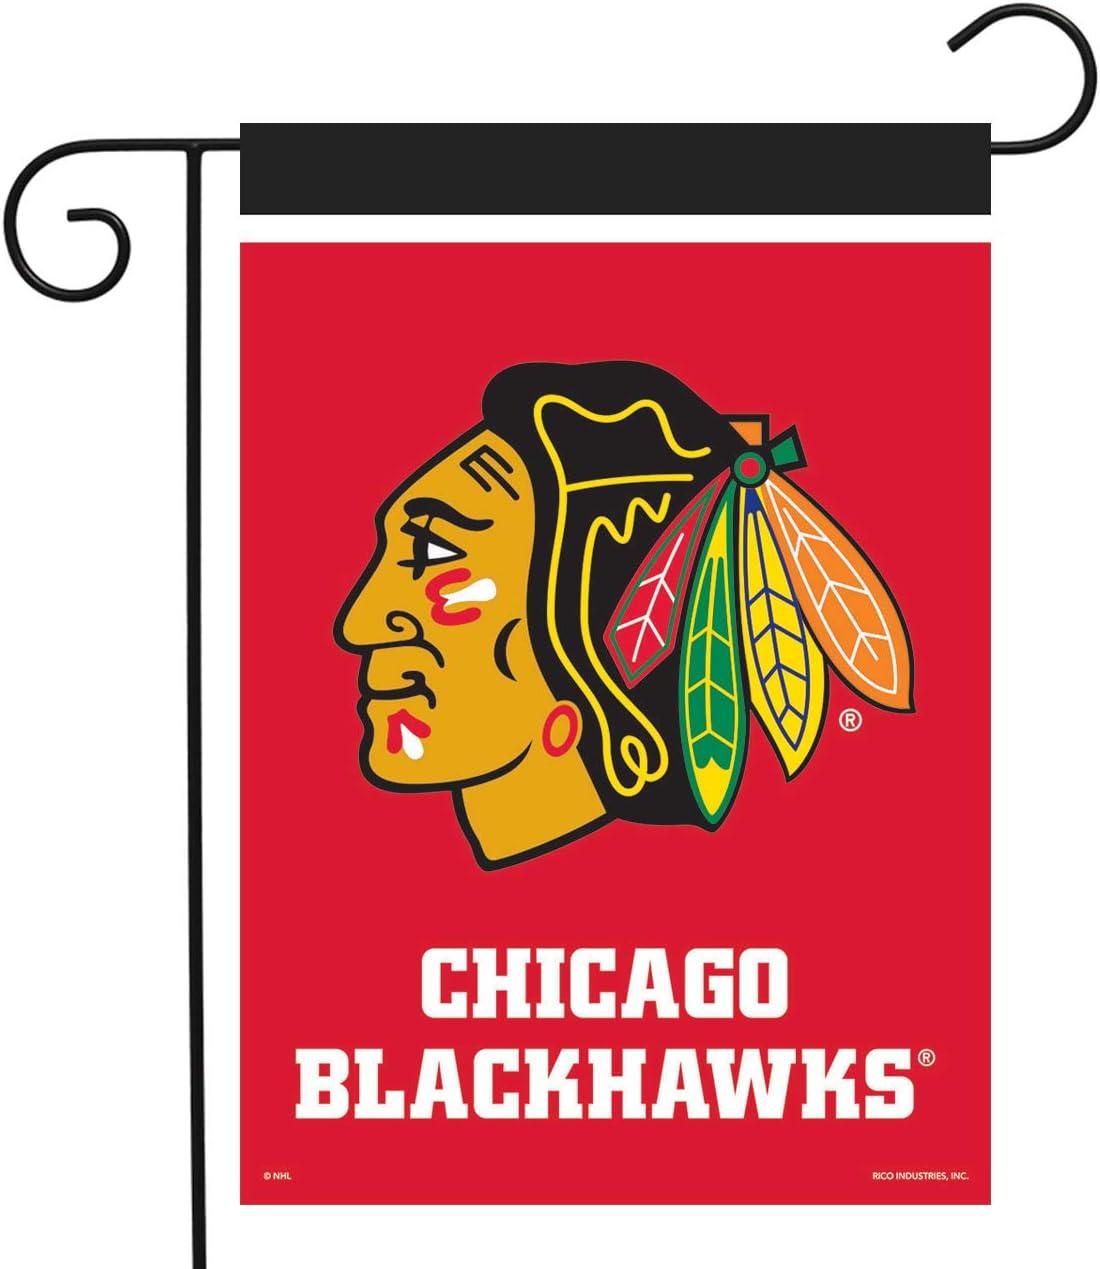 Sparo Chicago Blackhawks Garden Flag Hockey Licensed 12.5